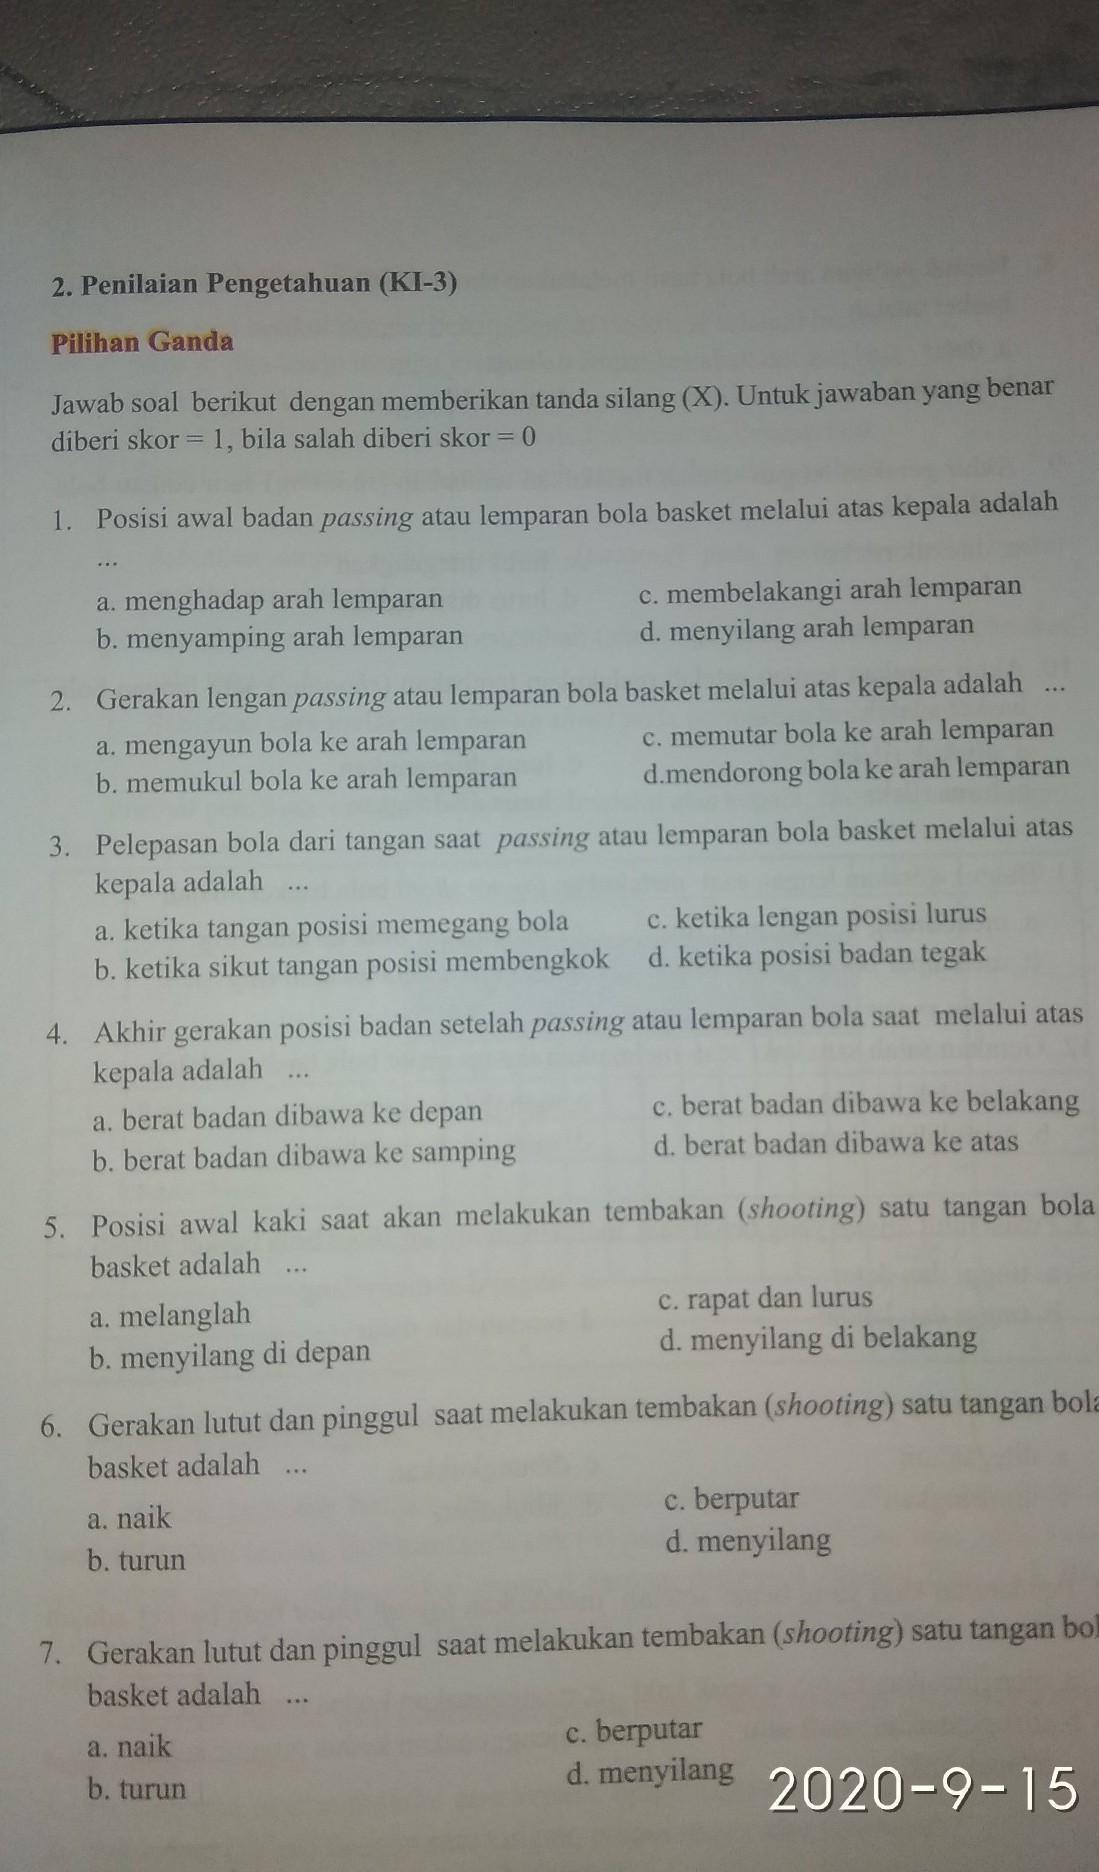 PDF BAB II LANDASAN TEORI A. 1. Permainan Bola Basket